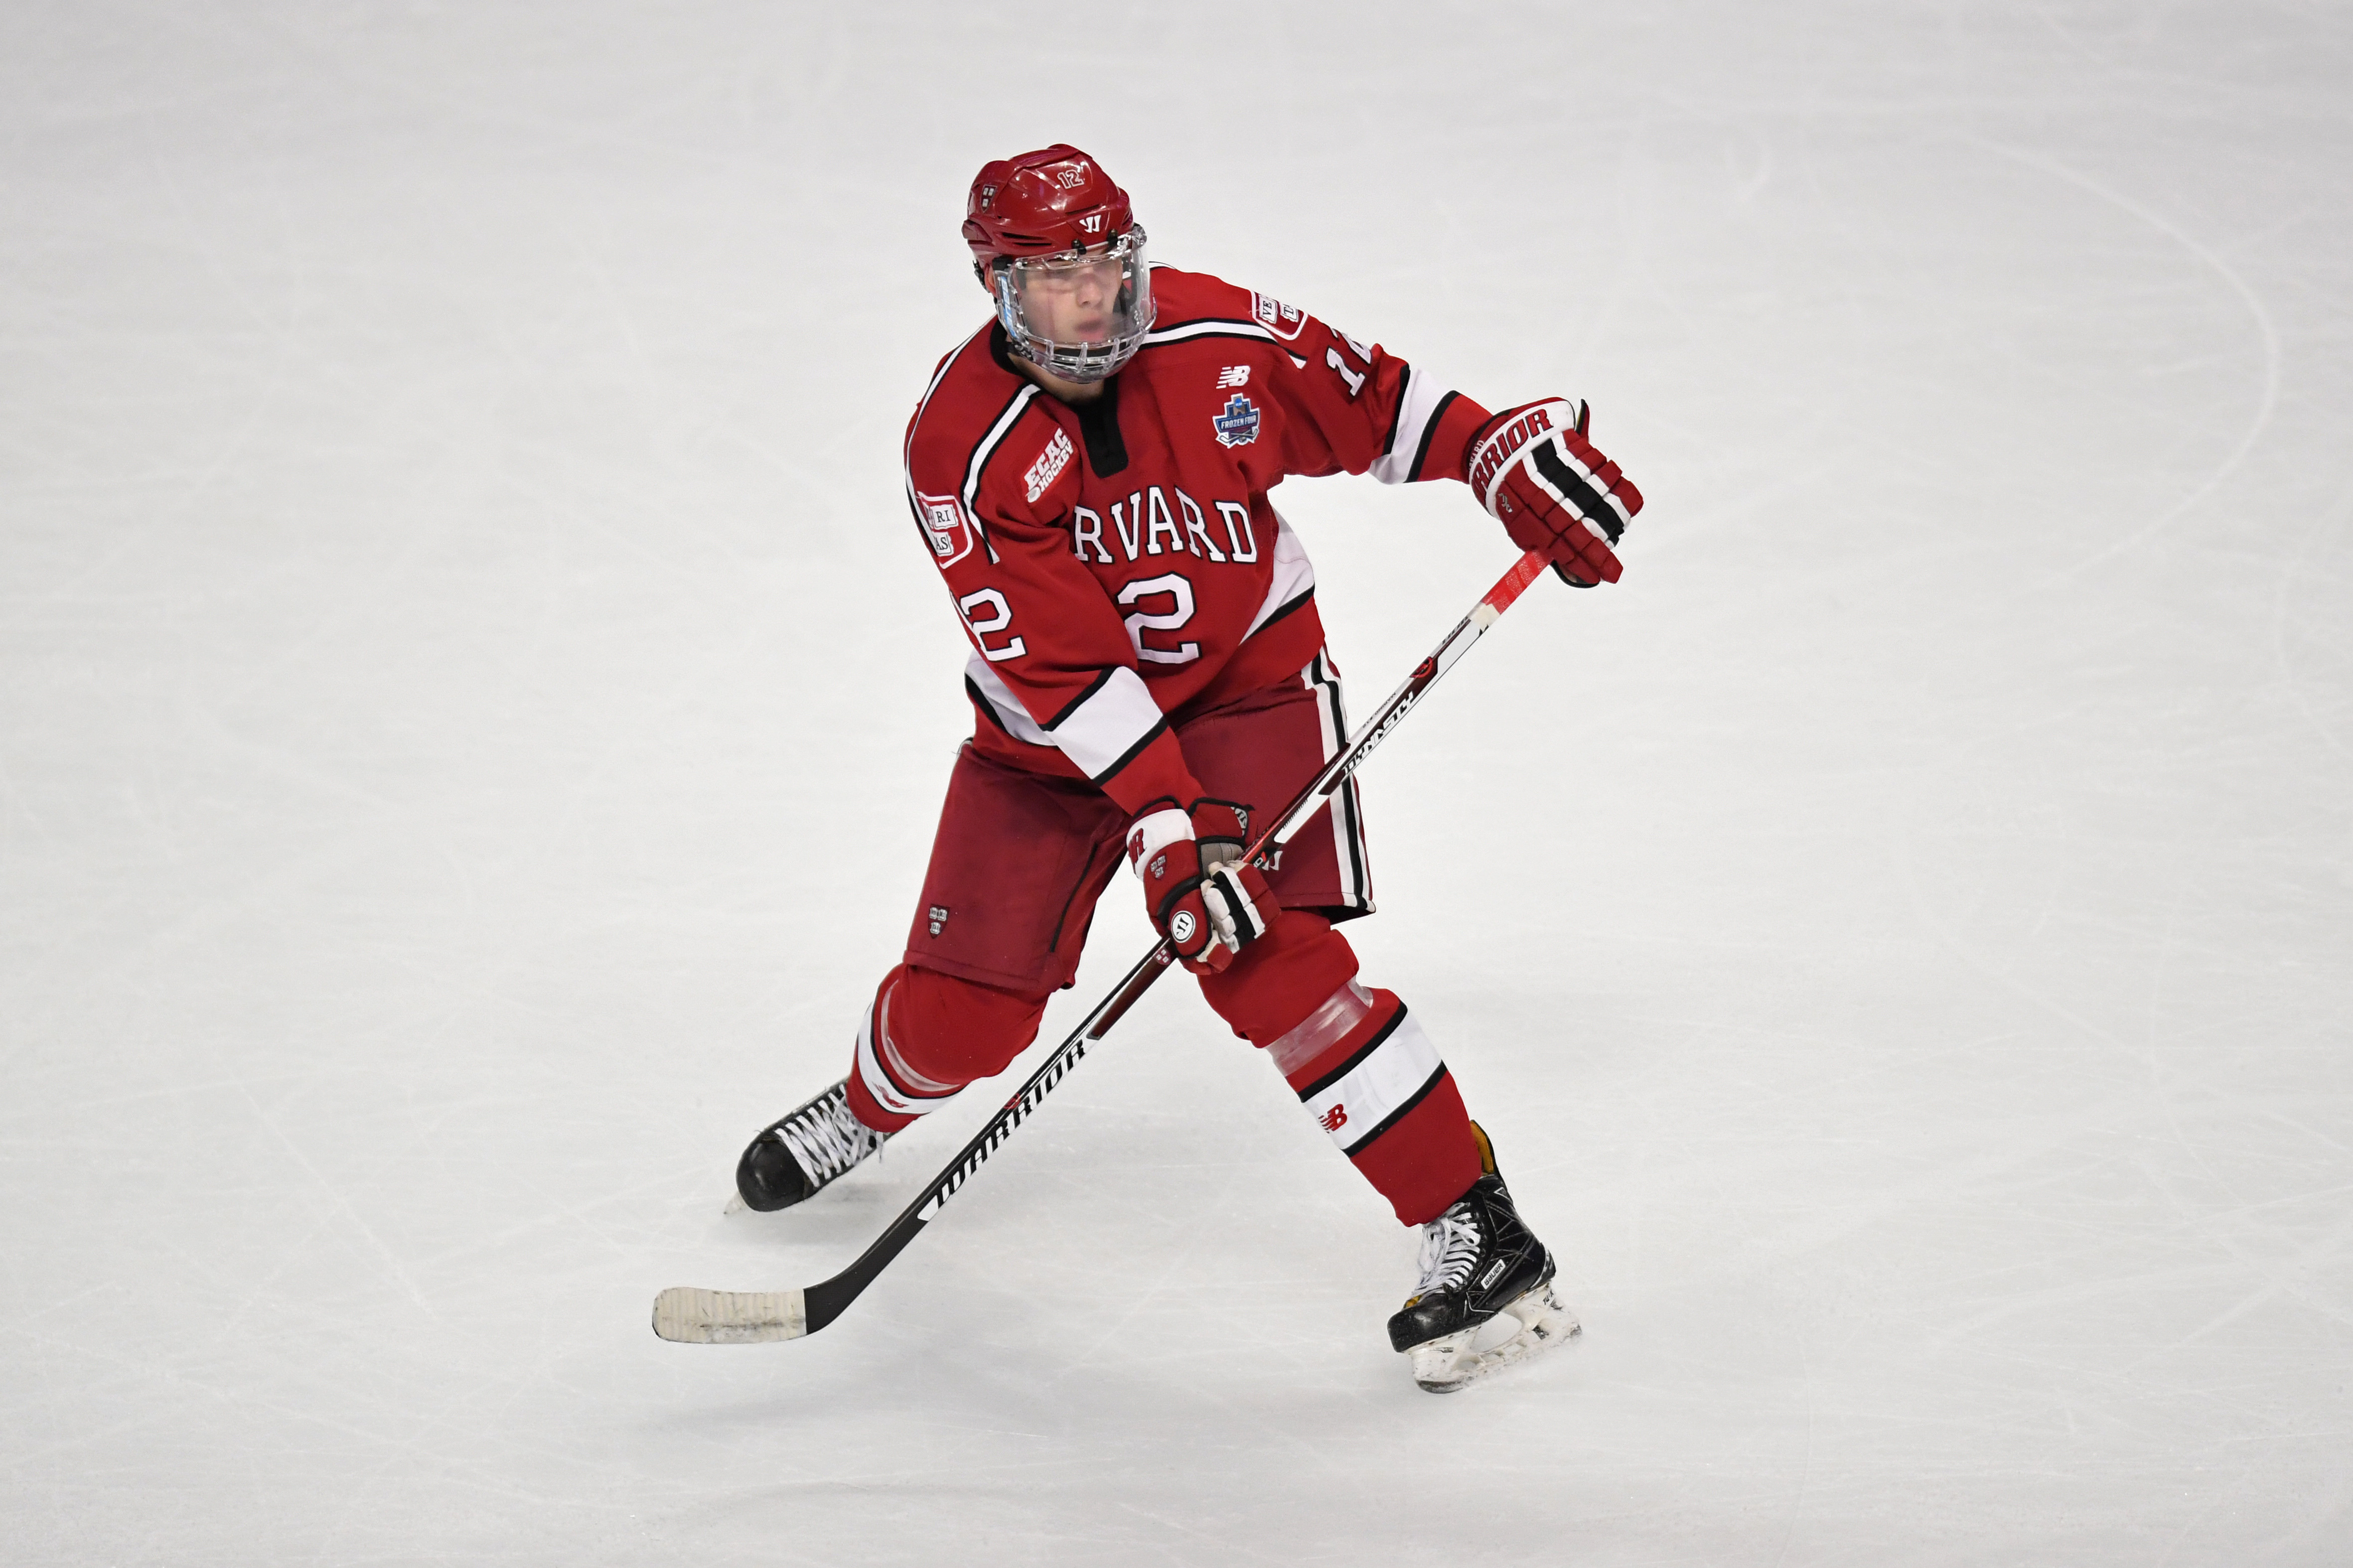 NCAA HOCKEY: APR 06 Frozen Four Semifinal - Harvard v Minnesota-Duluth